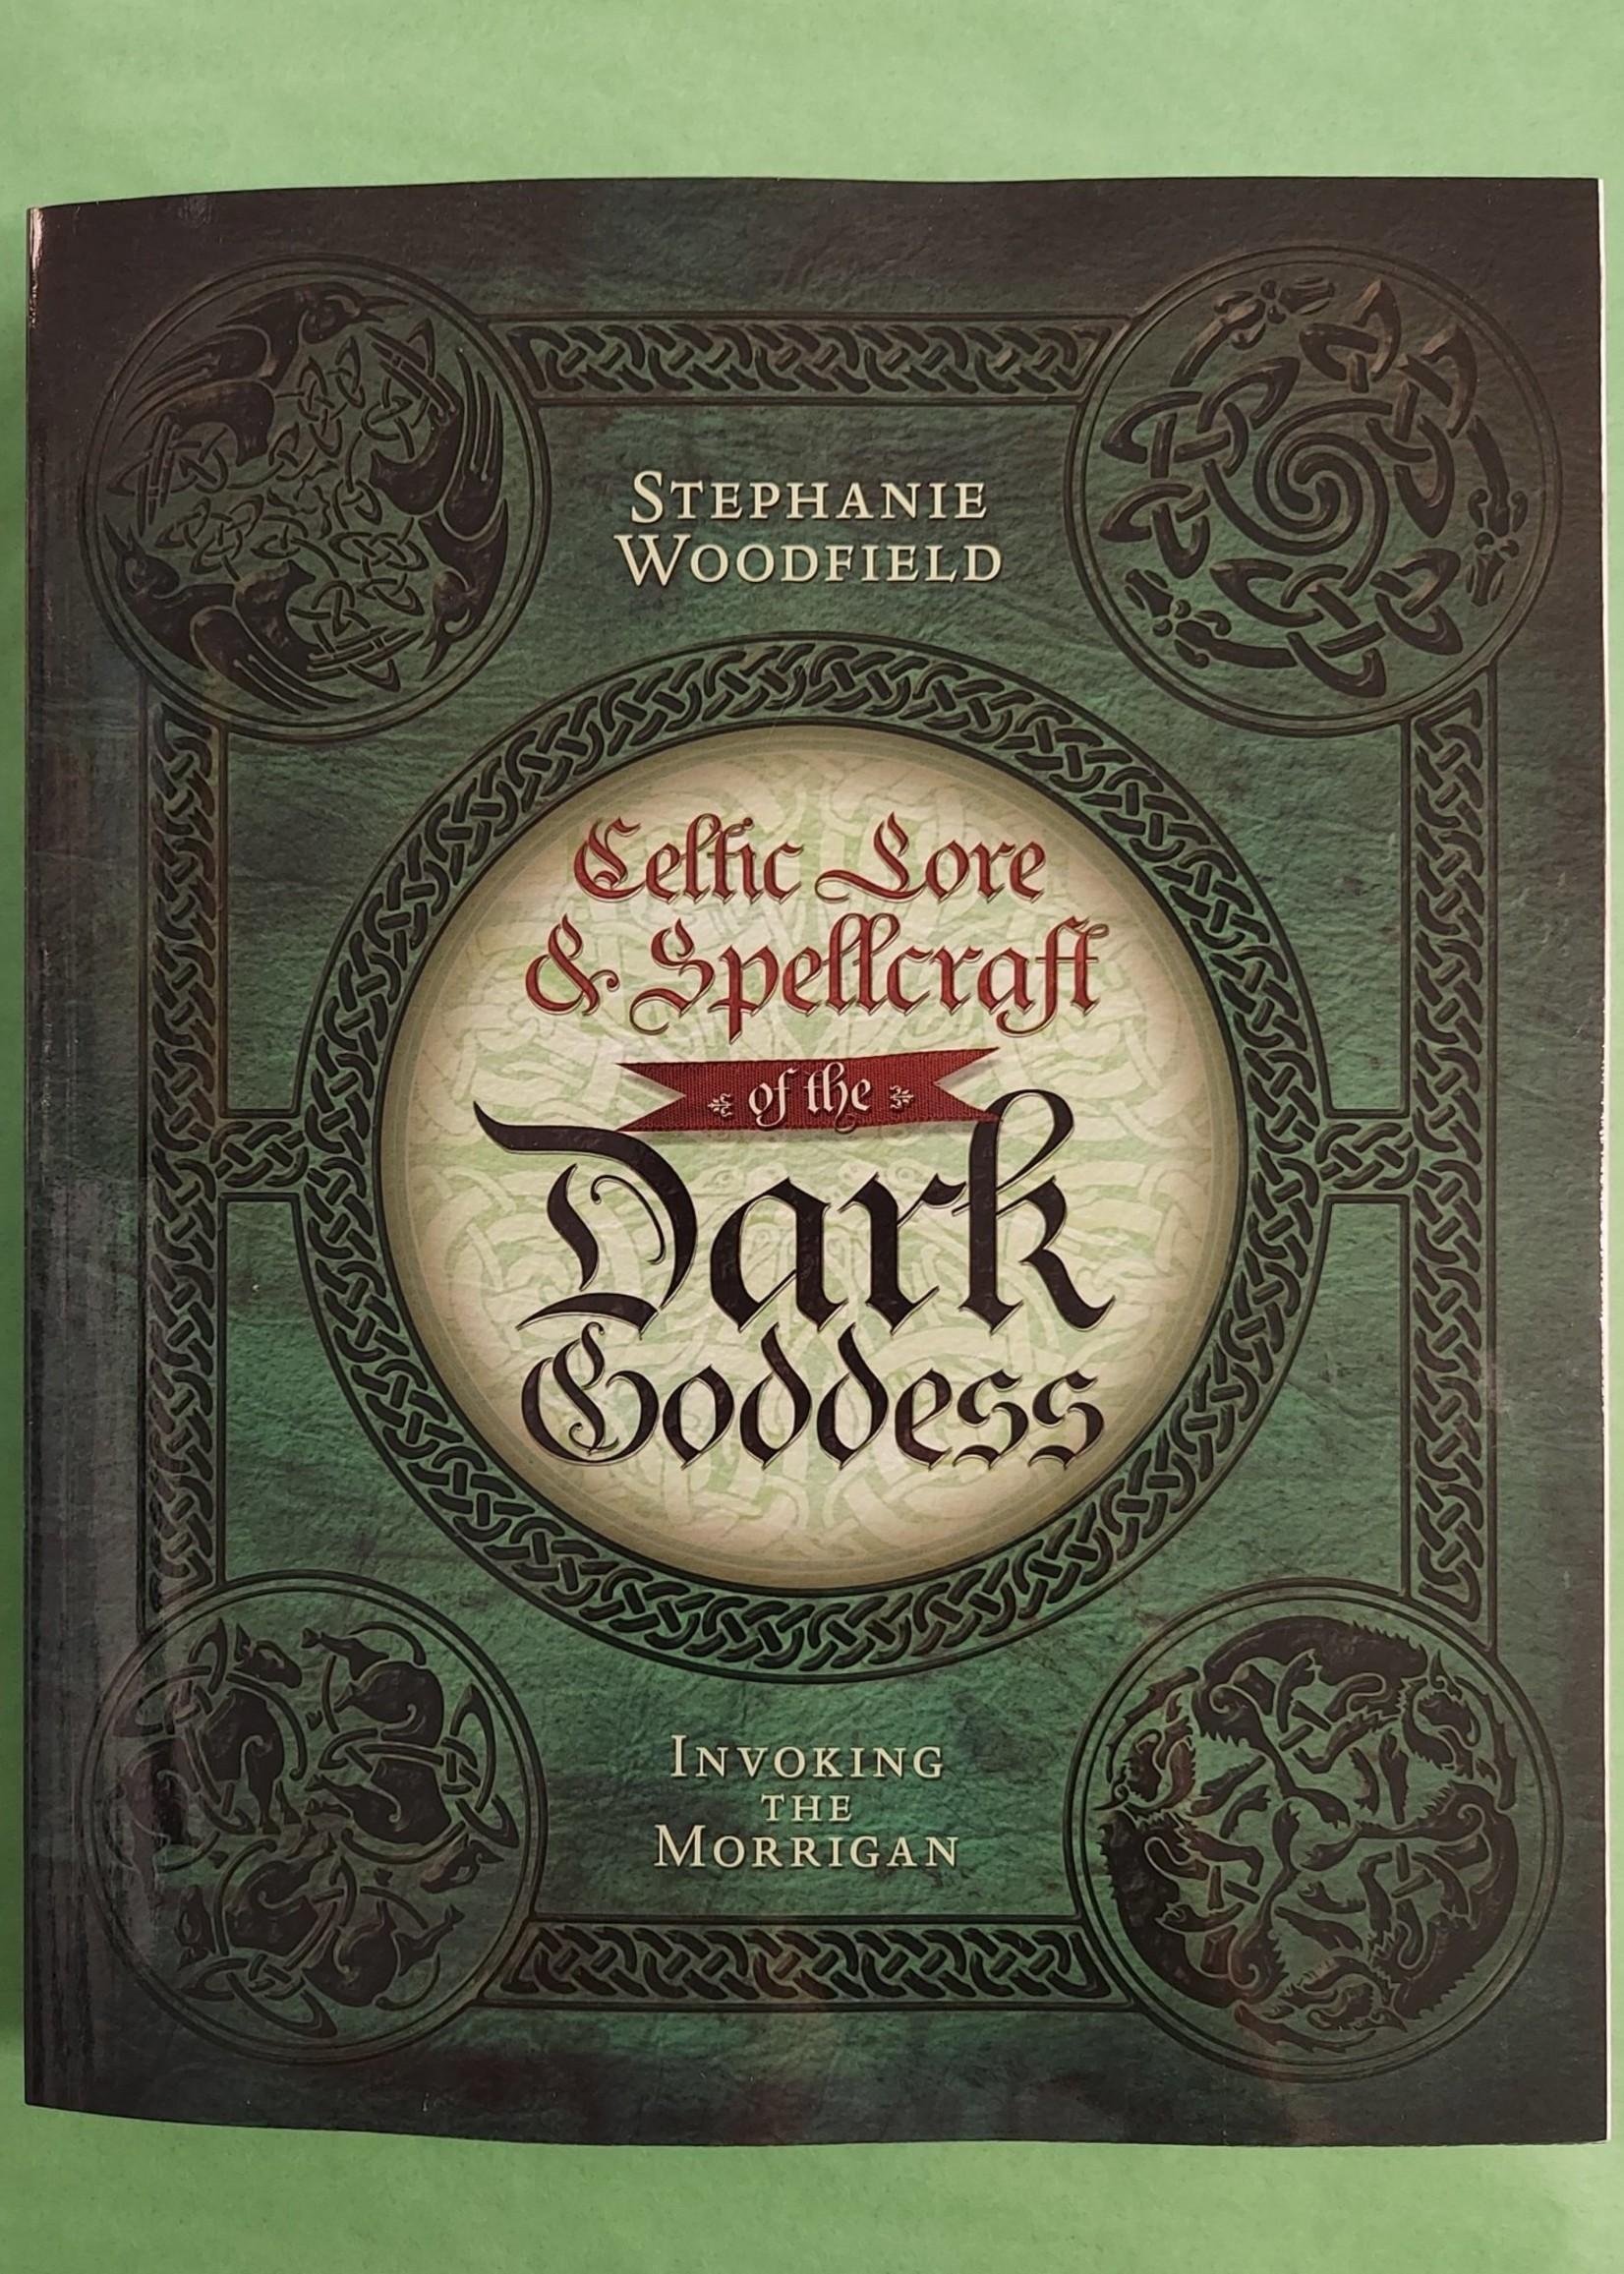 Celtic Lore & Spellcraft of the Dark Goddess-BY STEPHANIE WOODFIELD